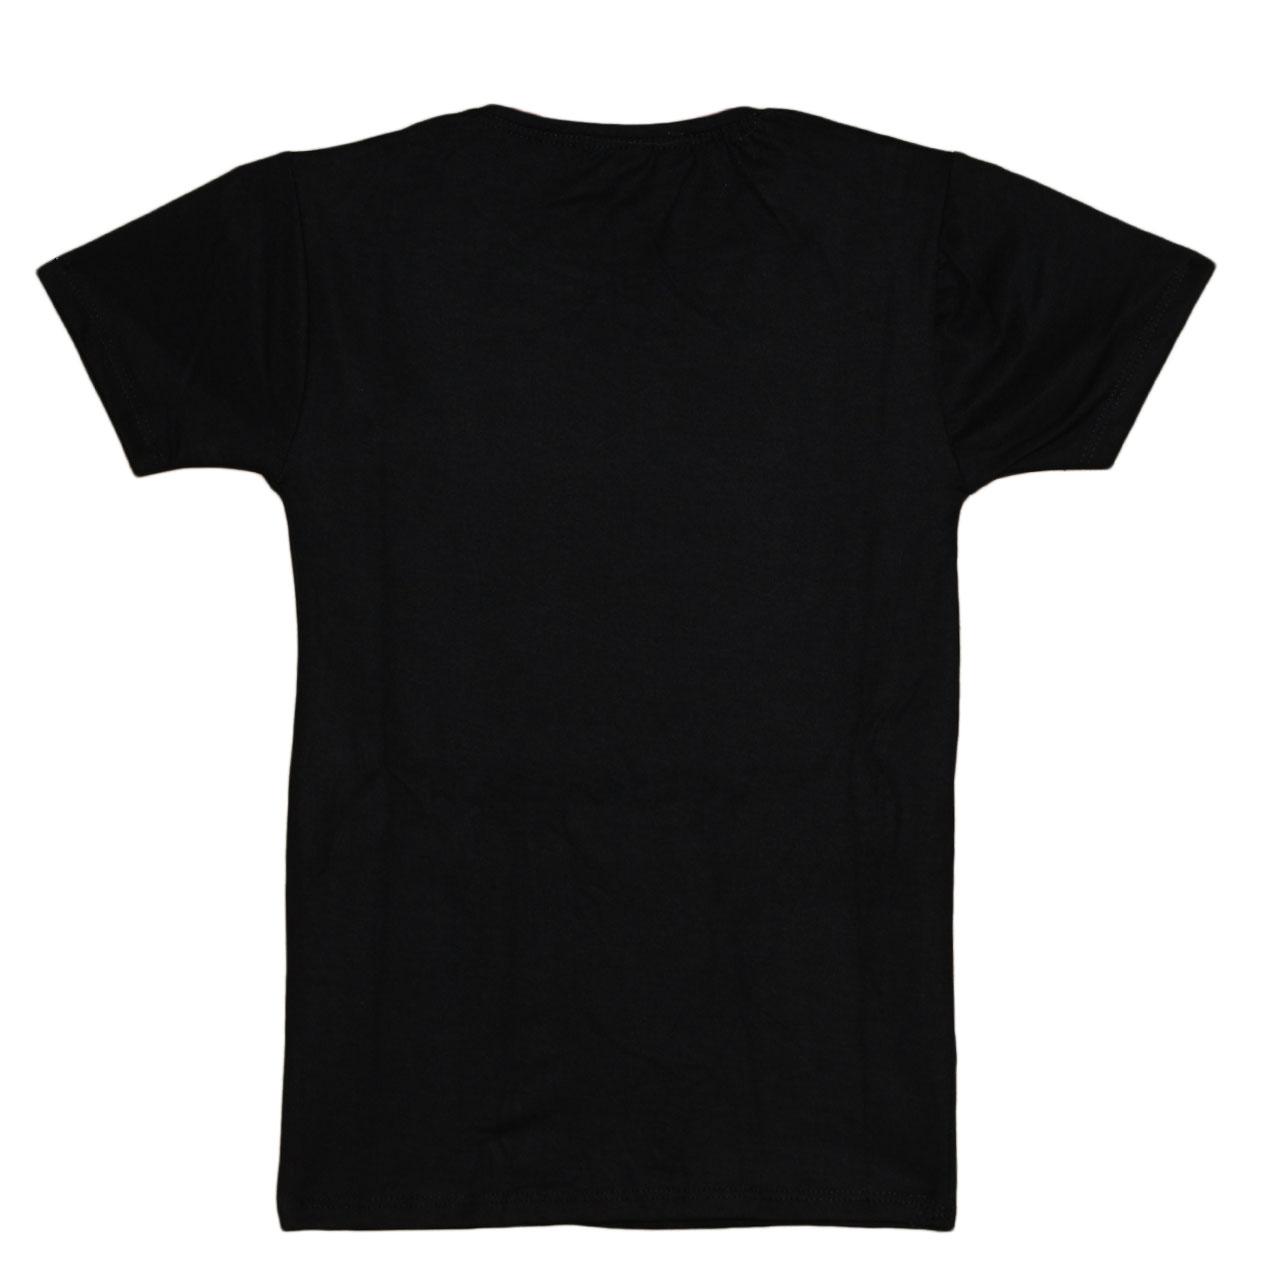 تی شرت پسرانه طرح جوکر کد 57